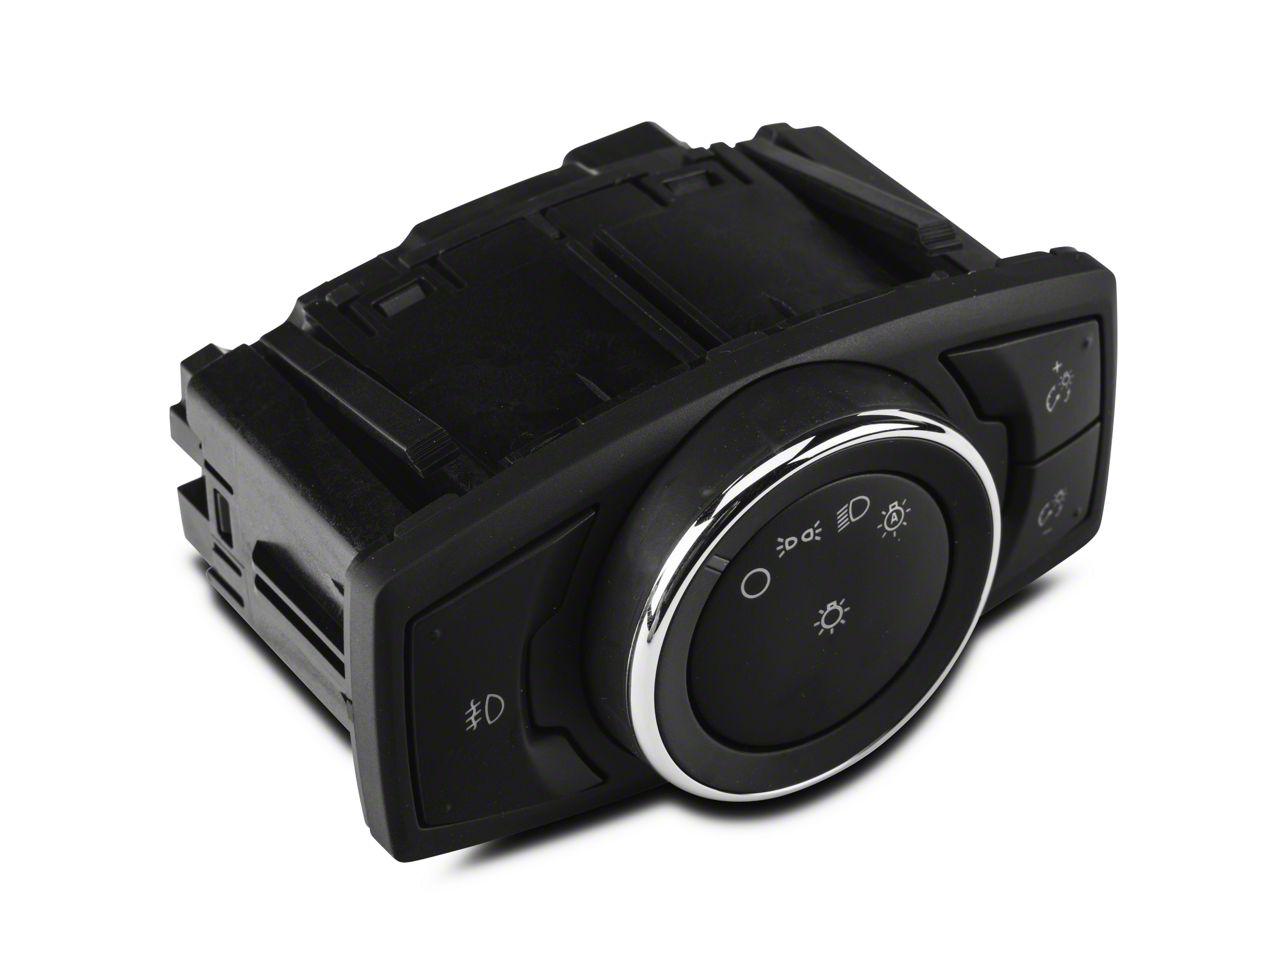 Ford Headlight Light Switch w/ Fog Lights (15-19 All)